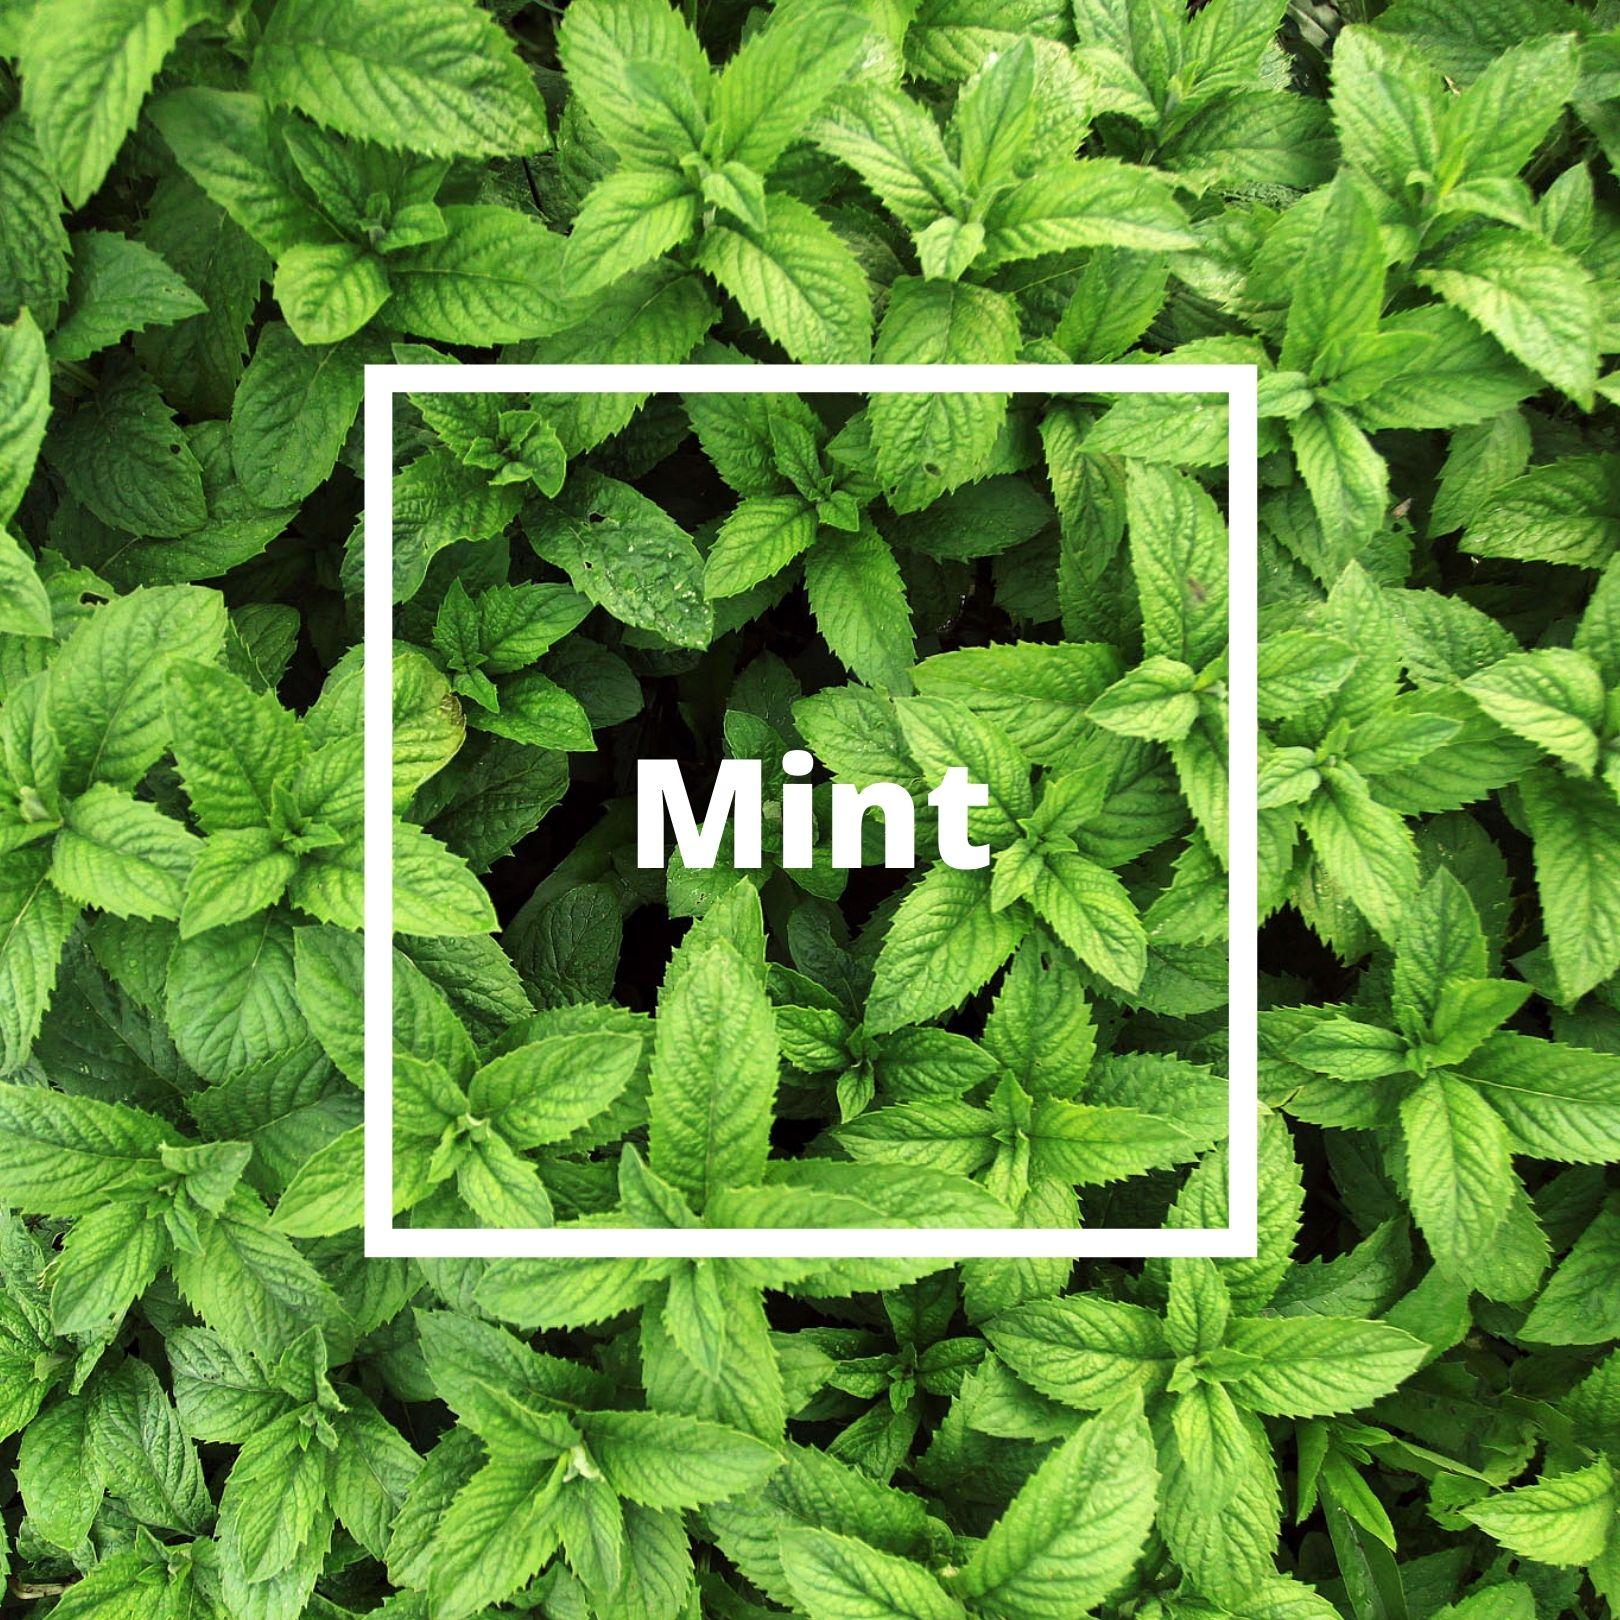 L'ATELIERO - Mint - Irresistible Man